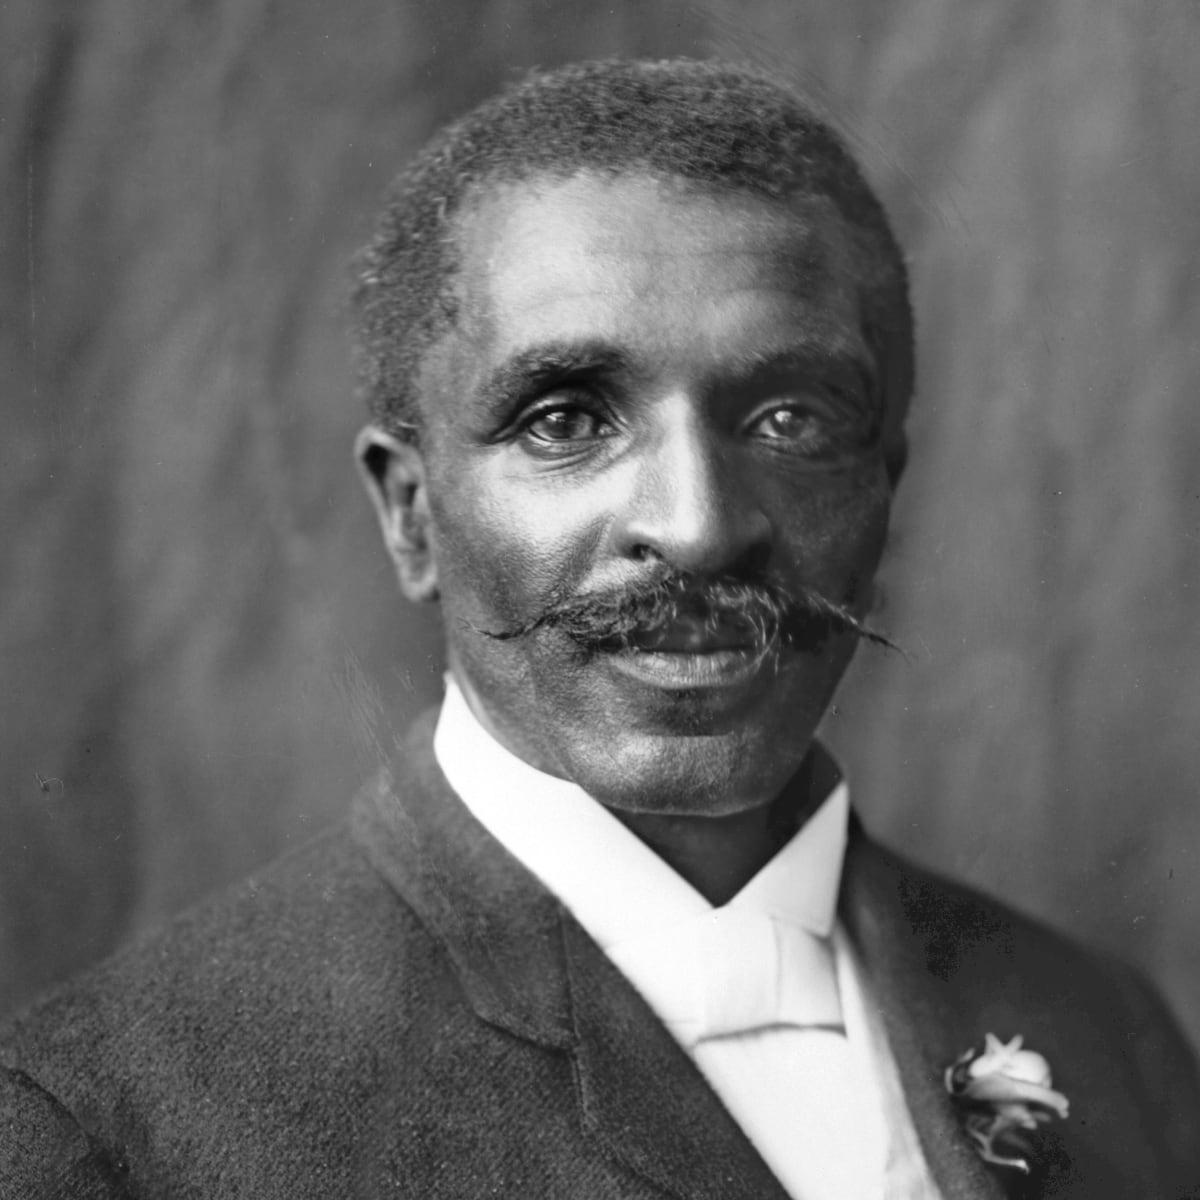 LGBTQ+ Inventors - George Washington Carver